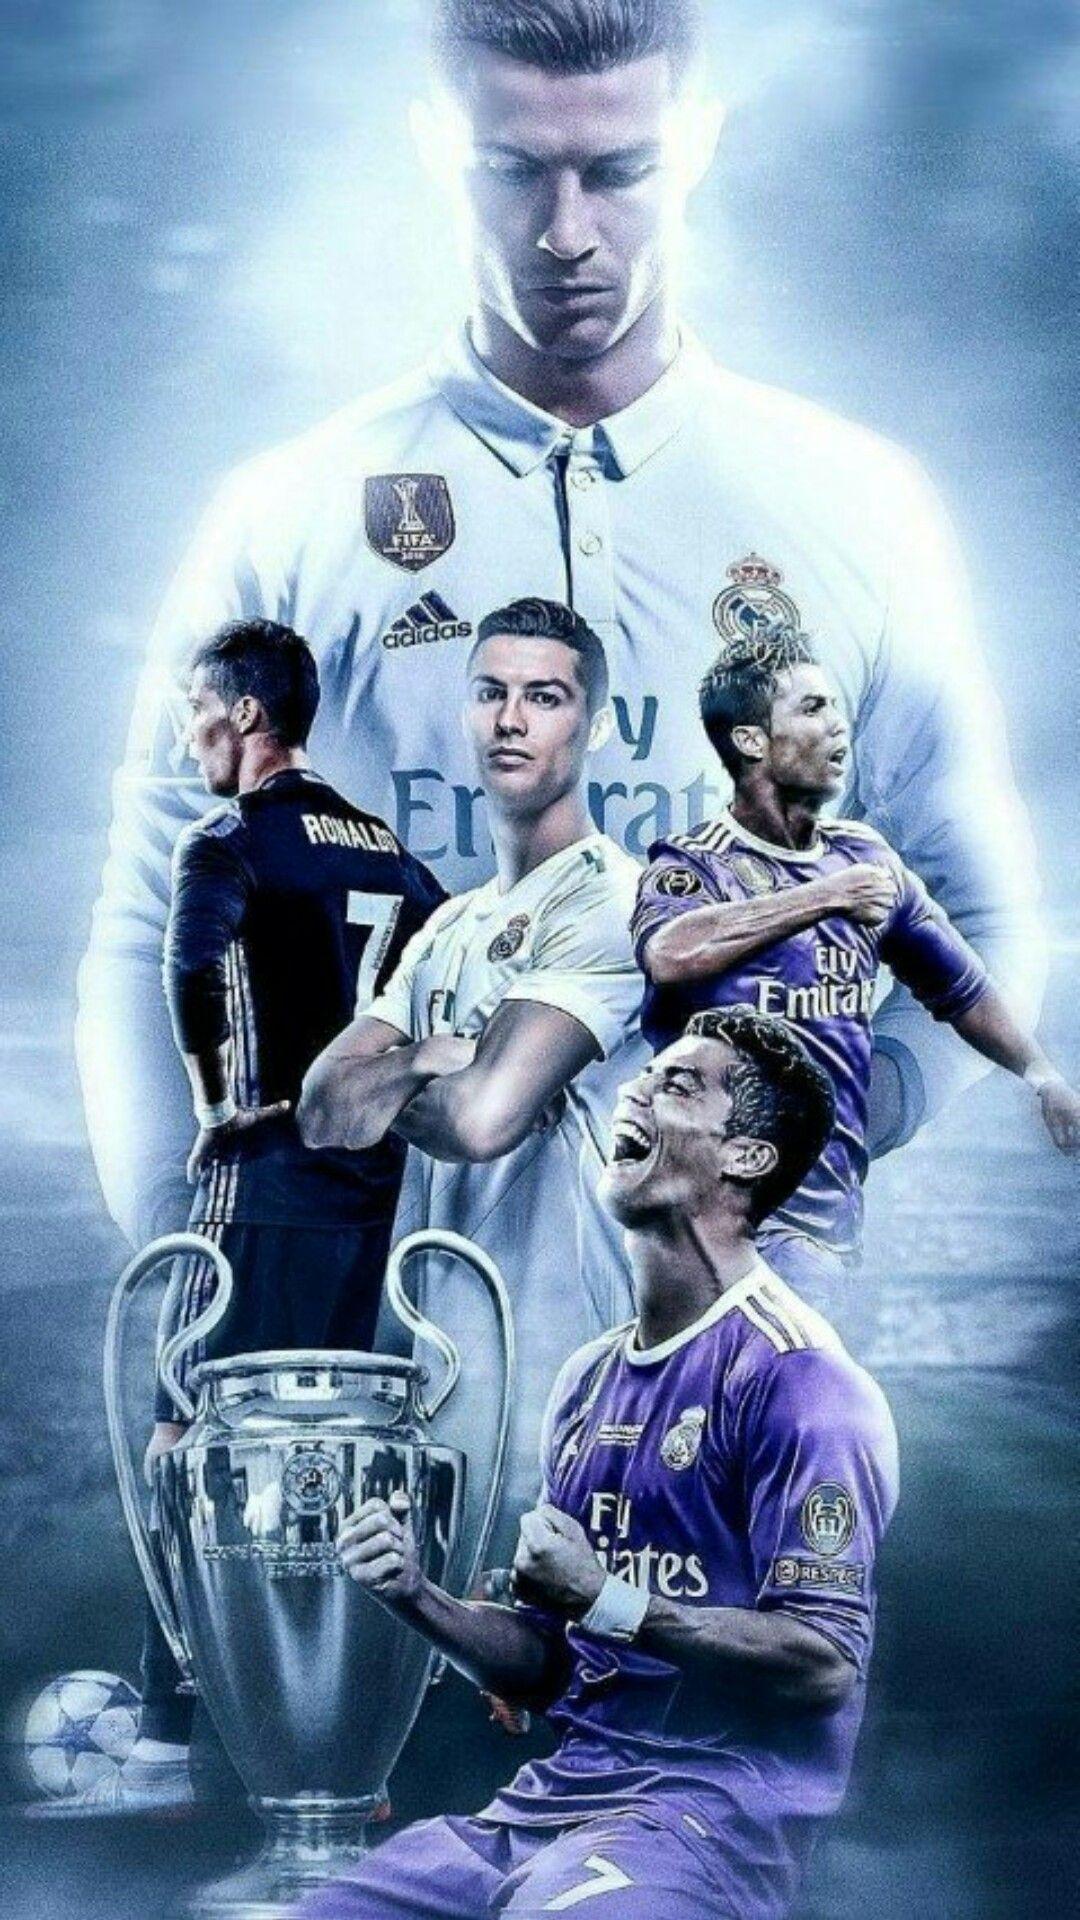 Fotos Del Real Madrid Real madrid wallpapers, Logo